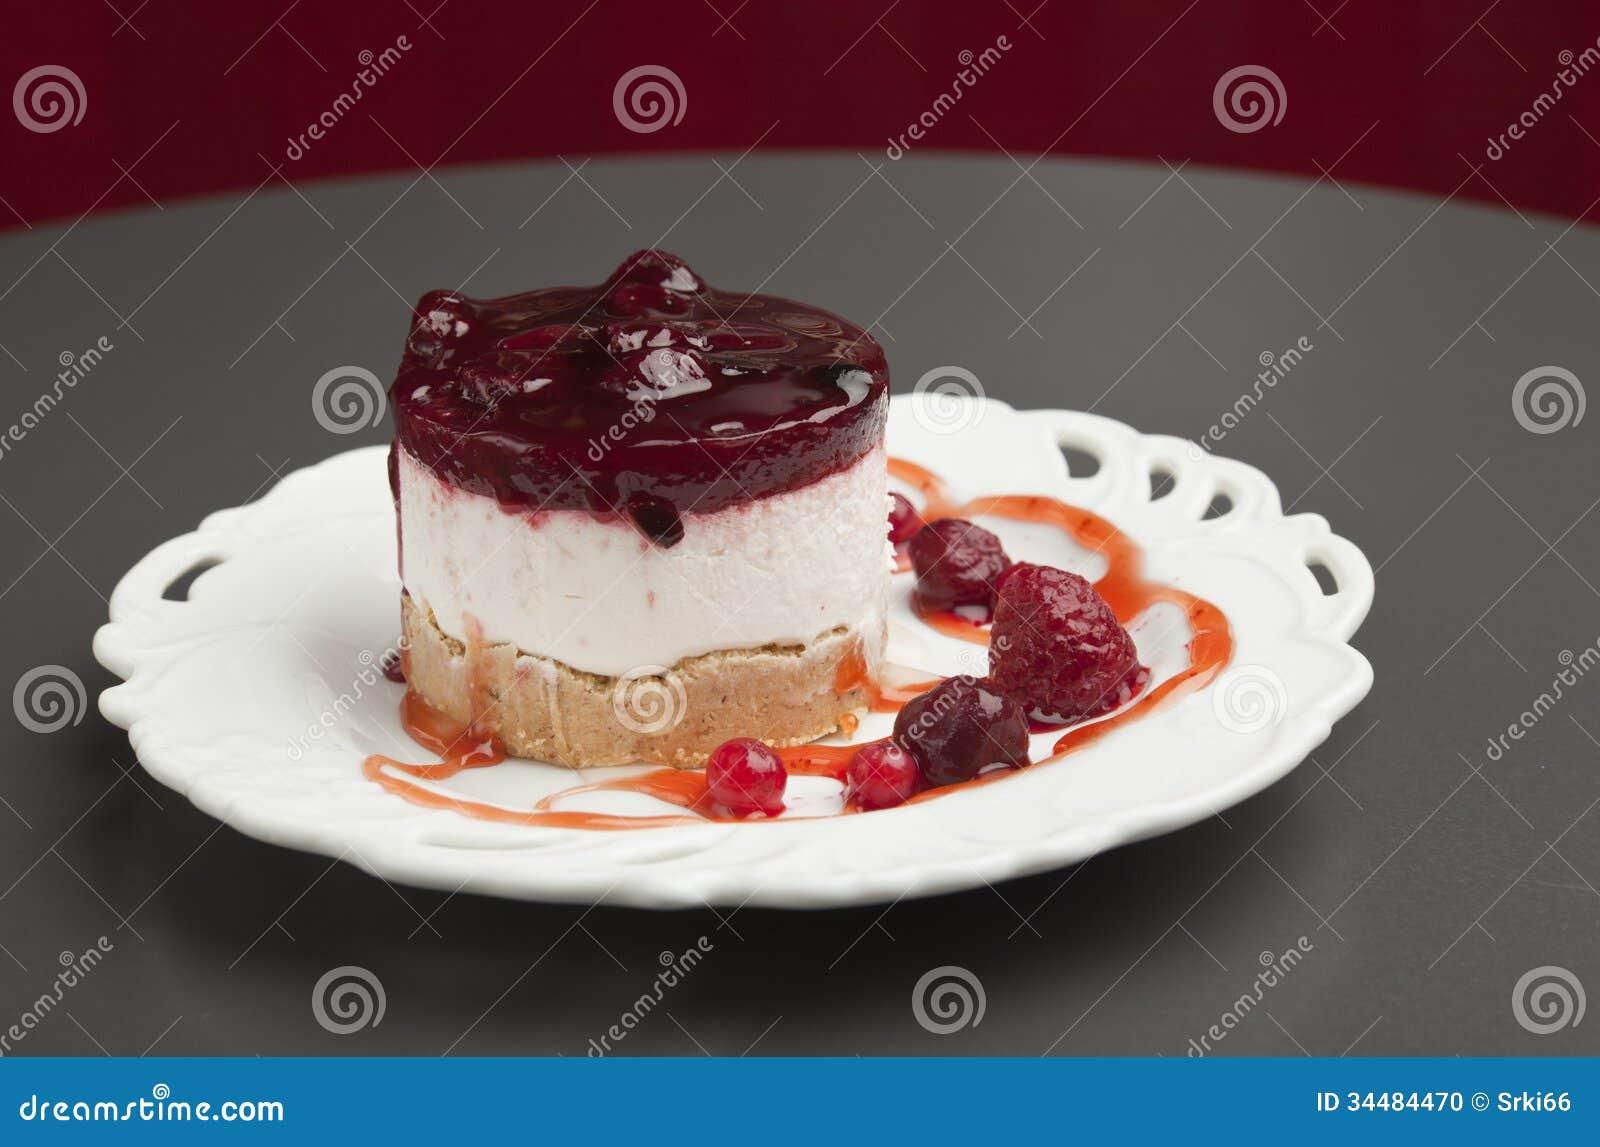 Royalty-Free Stock Photo & Cake stock photo. Image of color fresh gourmet bakery - 34484470